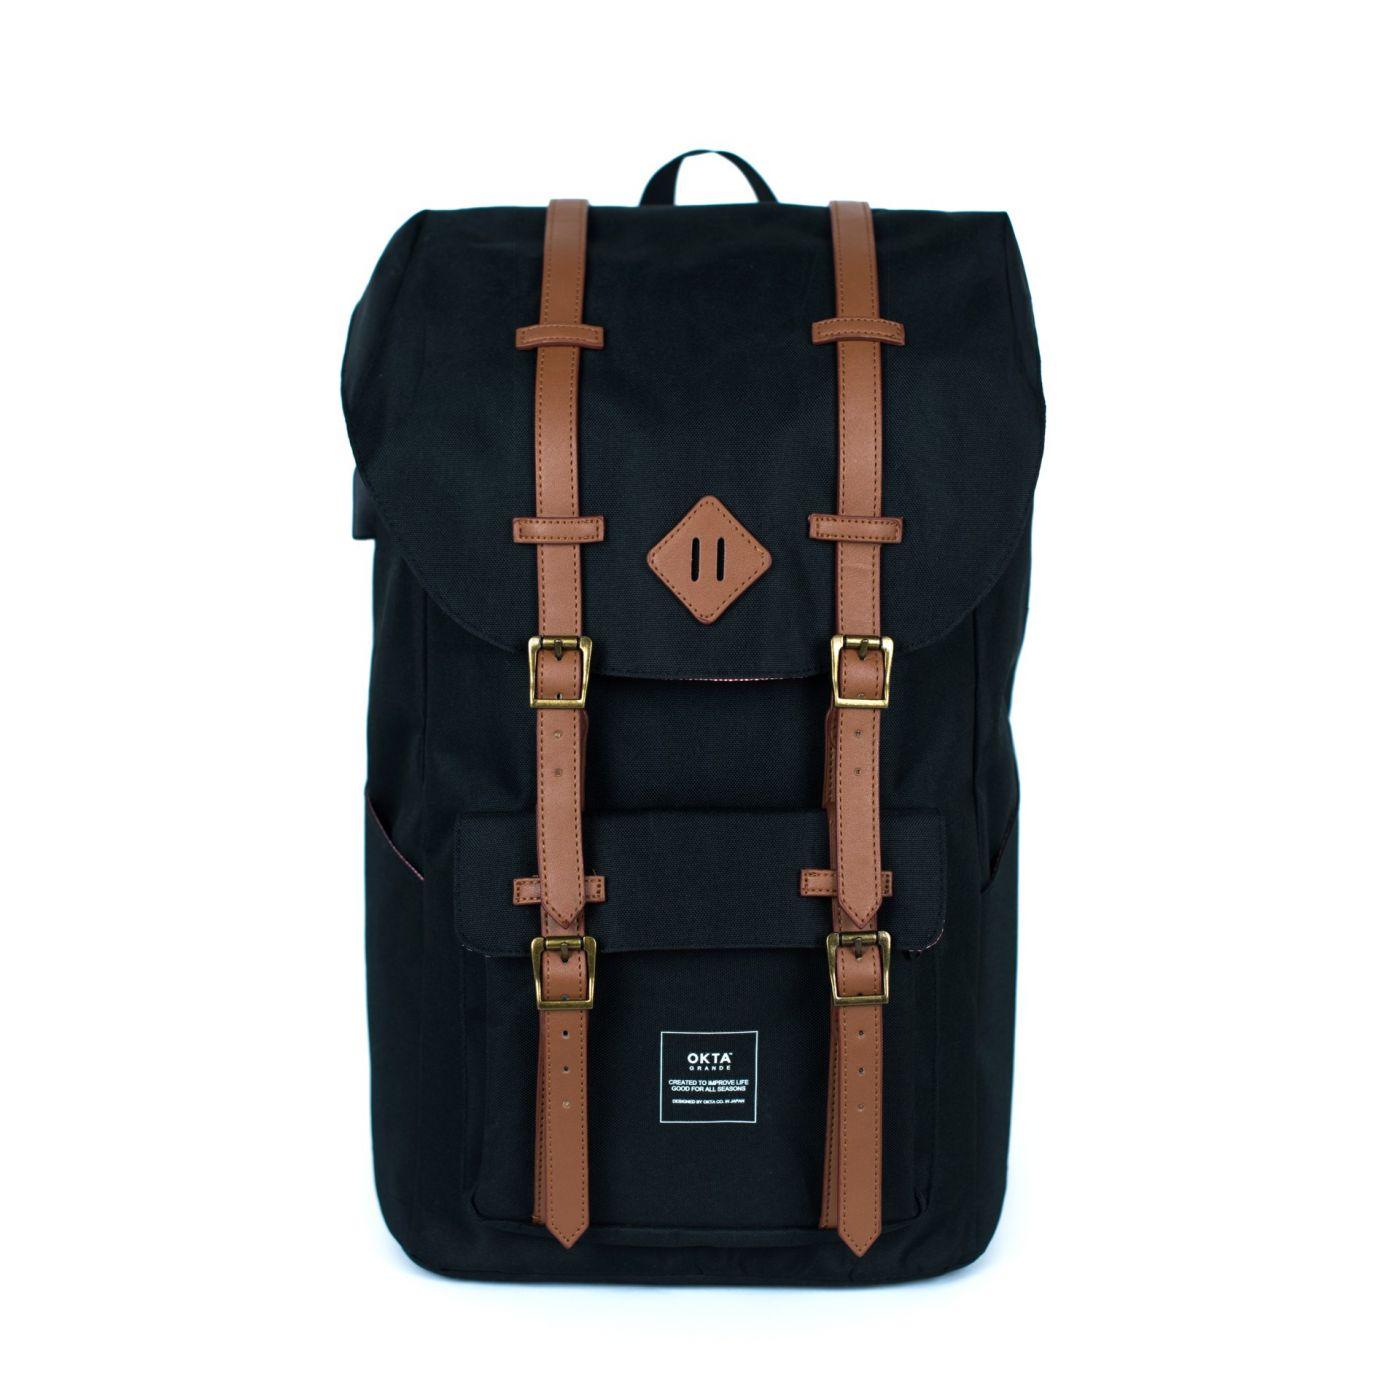 Art Of Polo Unisex's Backpack tr20231